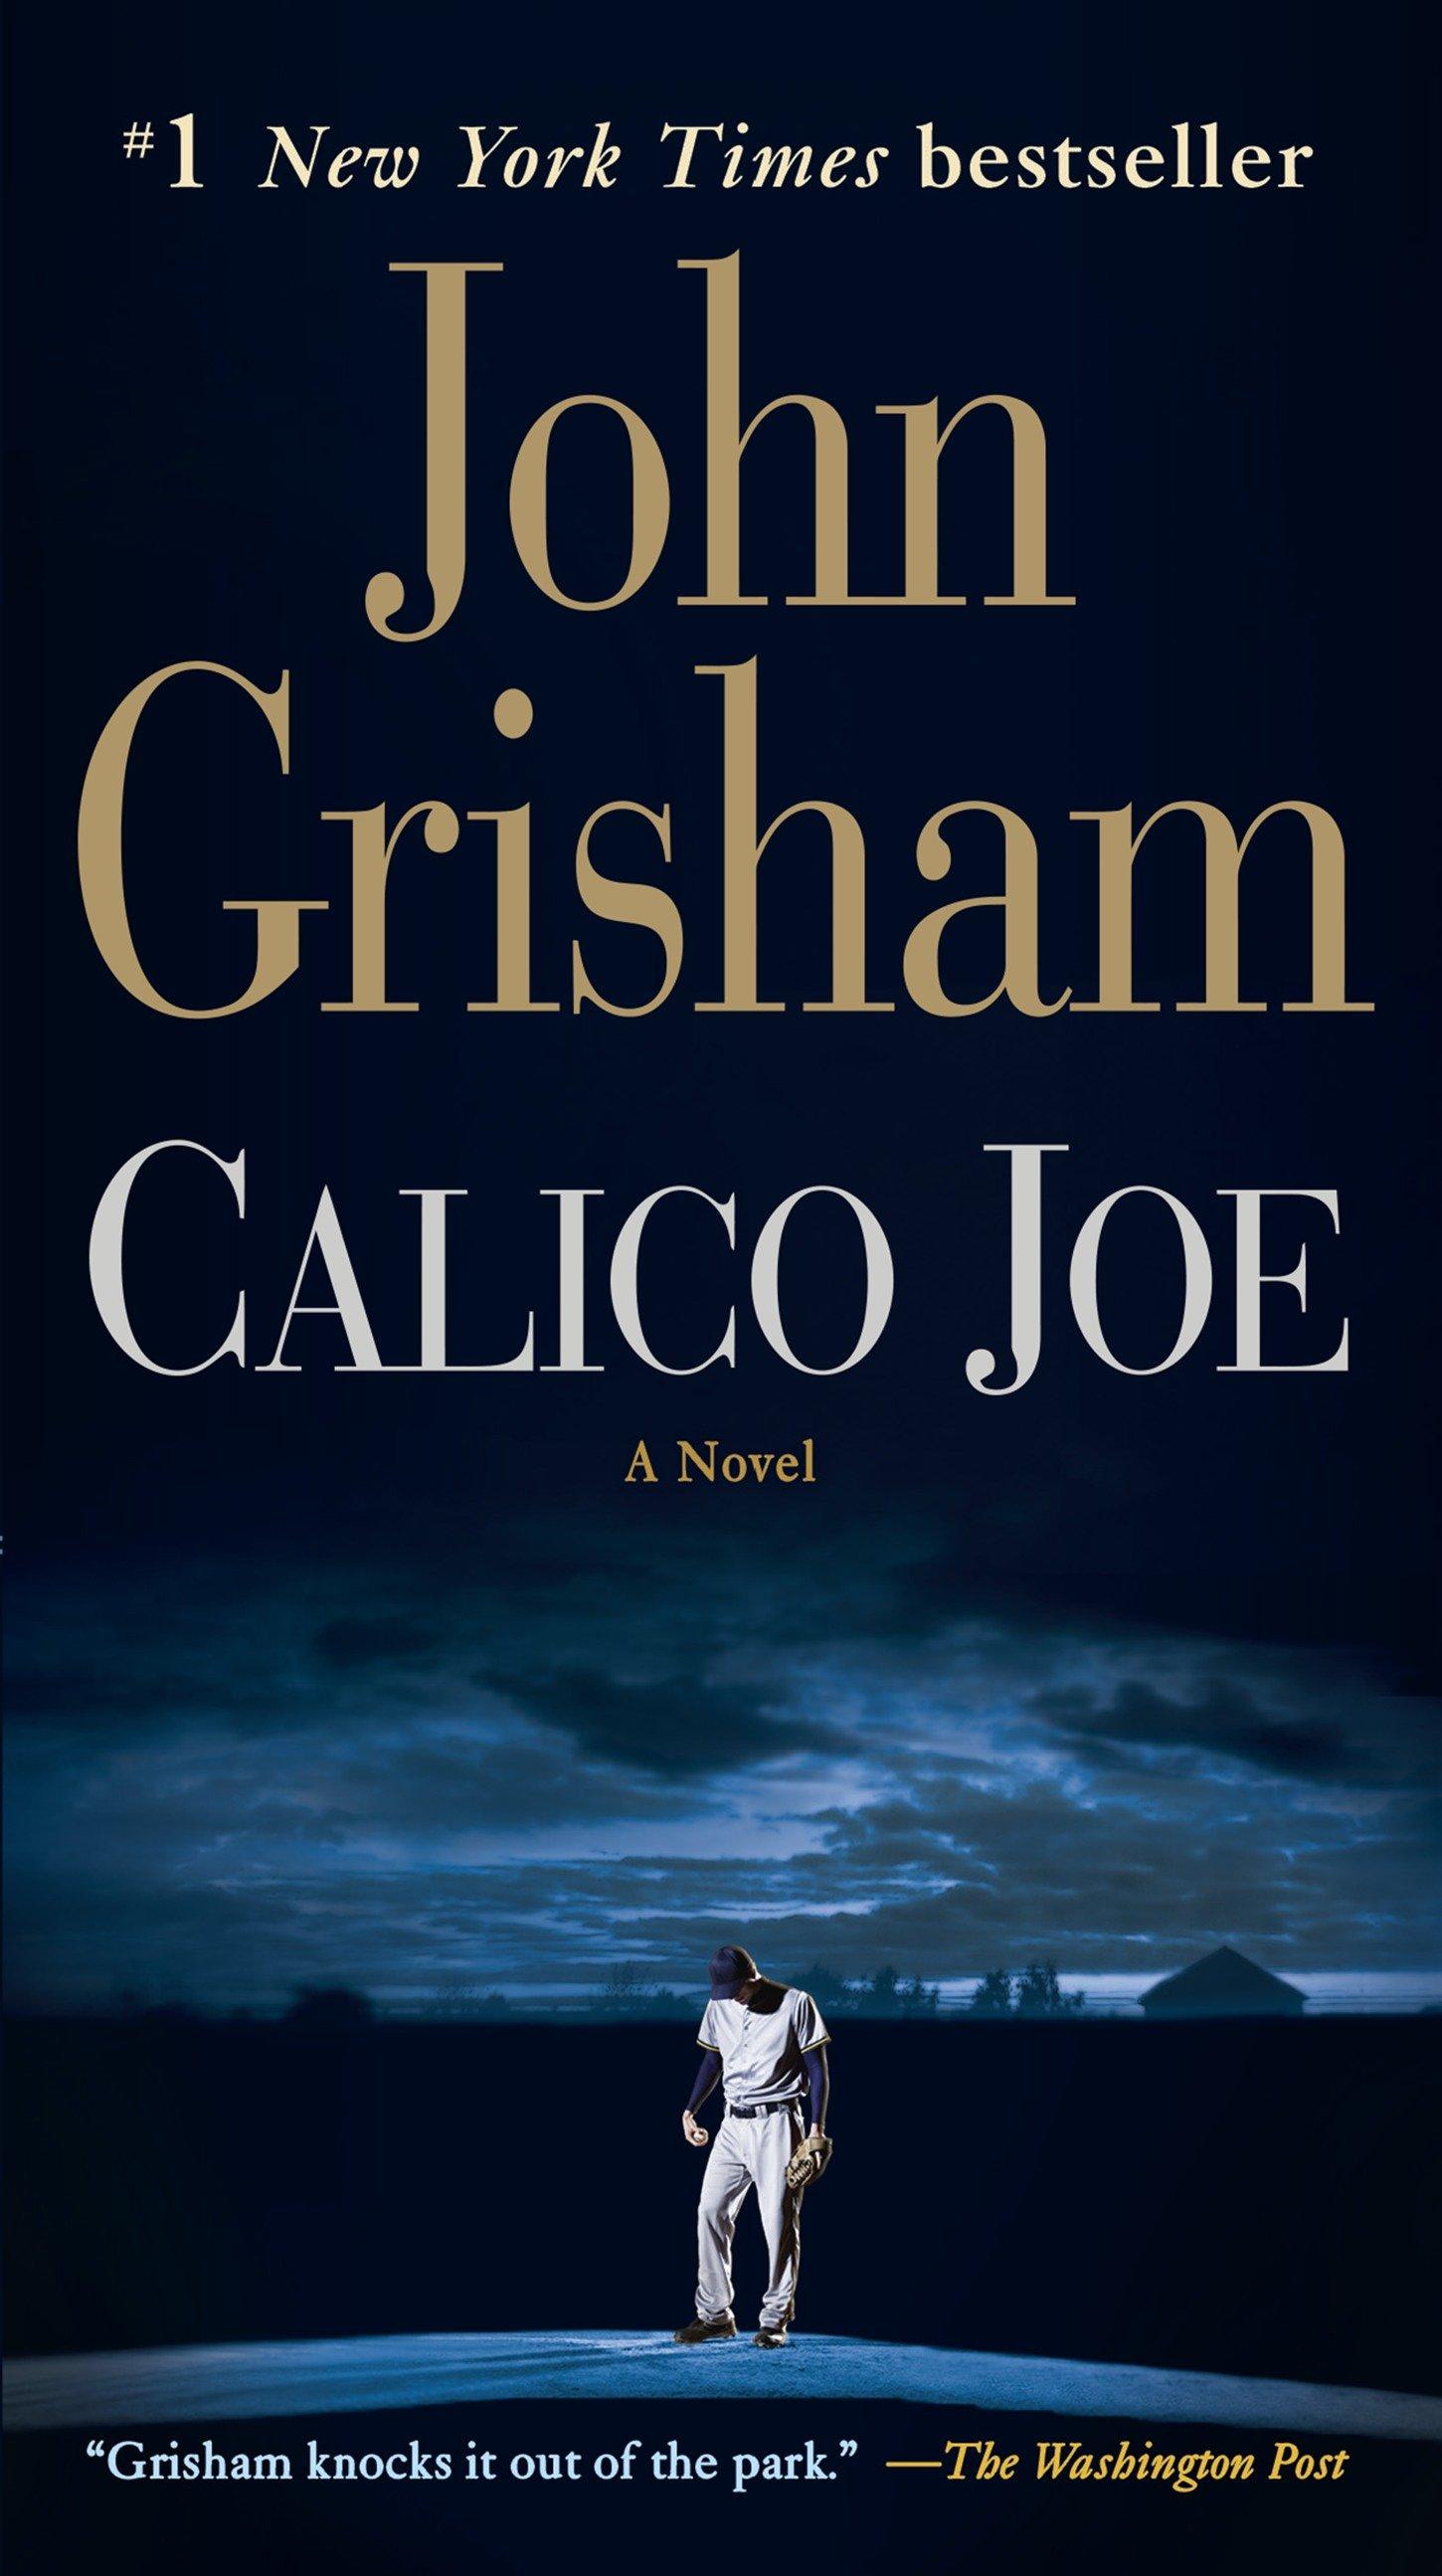 Calico Joe cover image